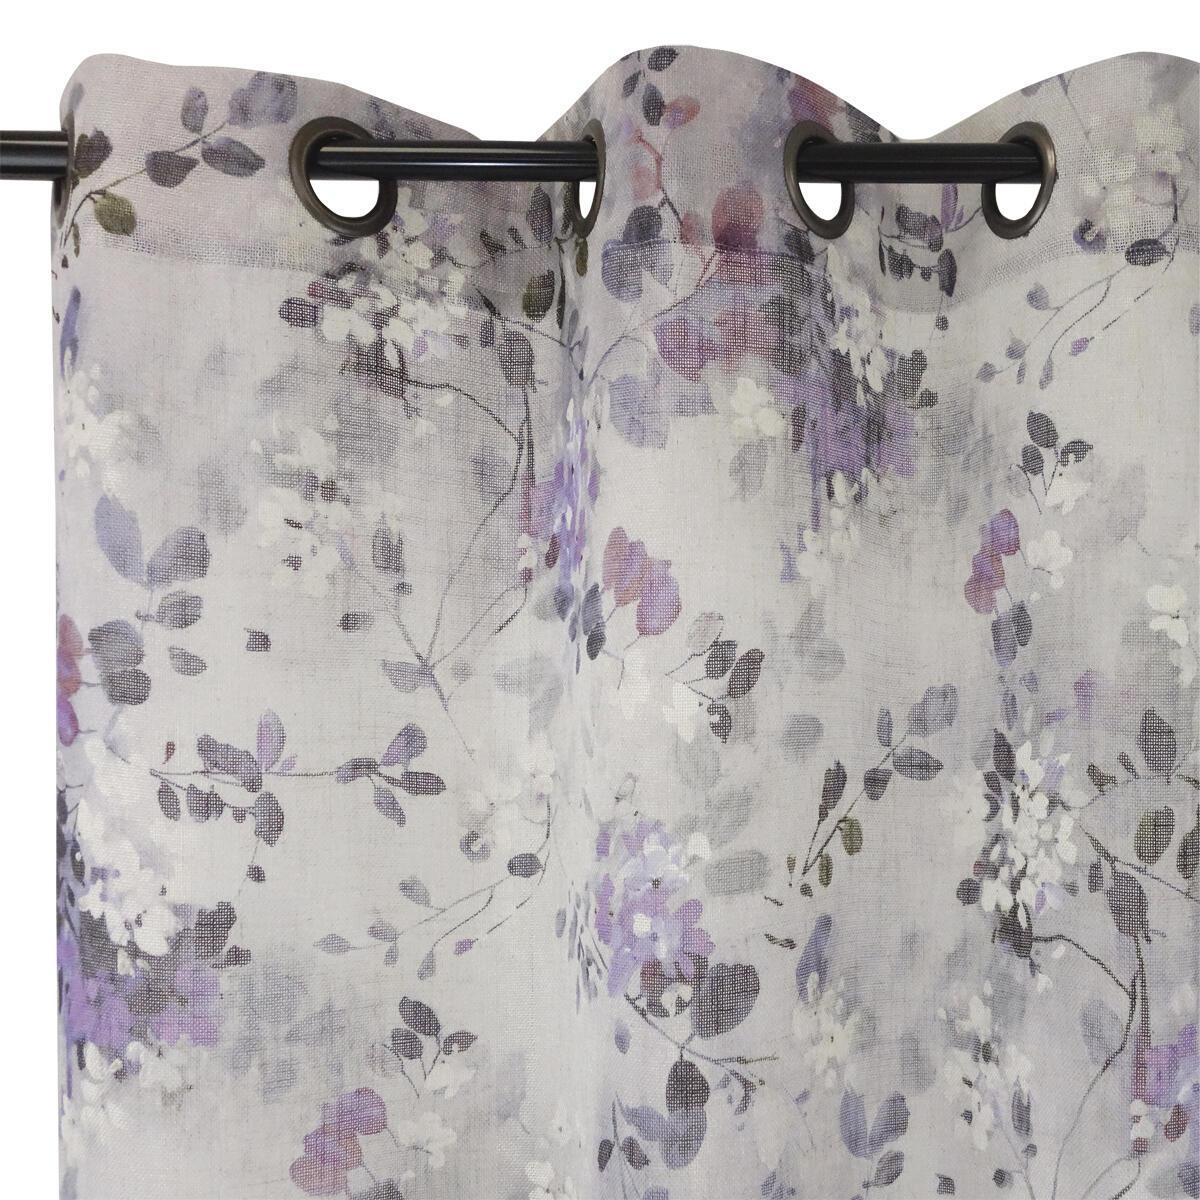 Tenda Romane viola occhielli 140 x 280 cm - 3